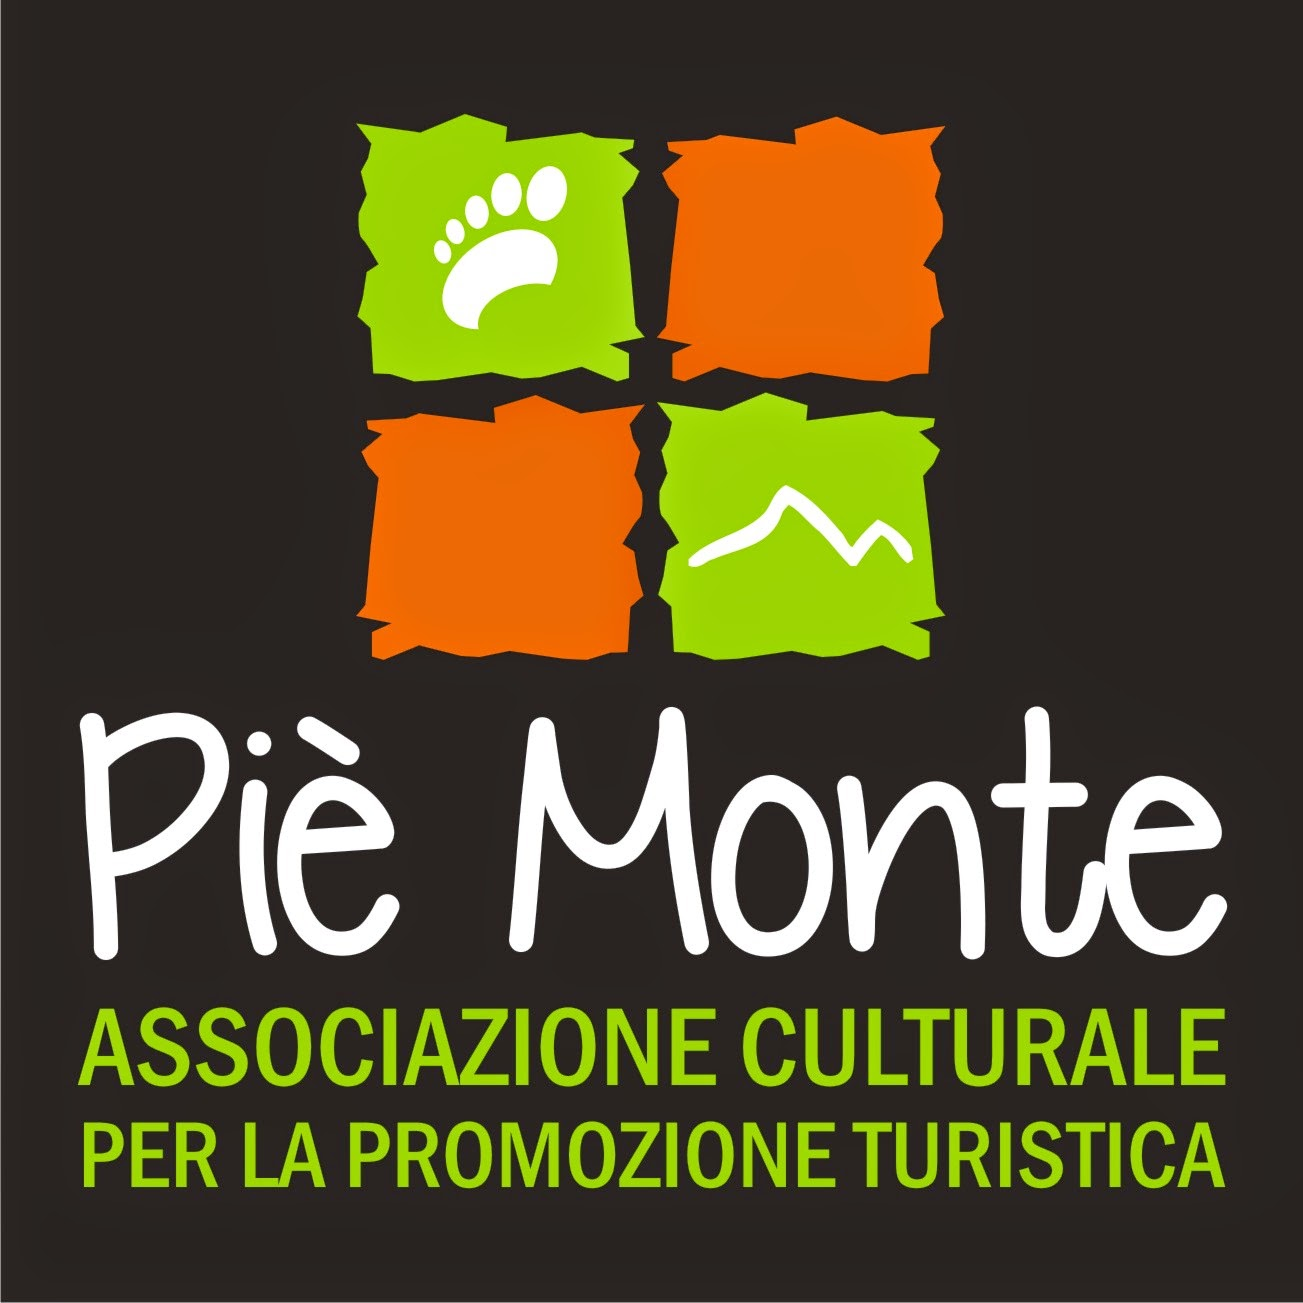 Piè Monte